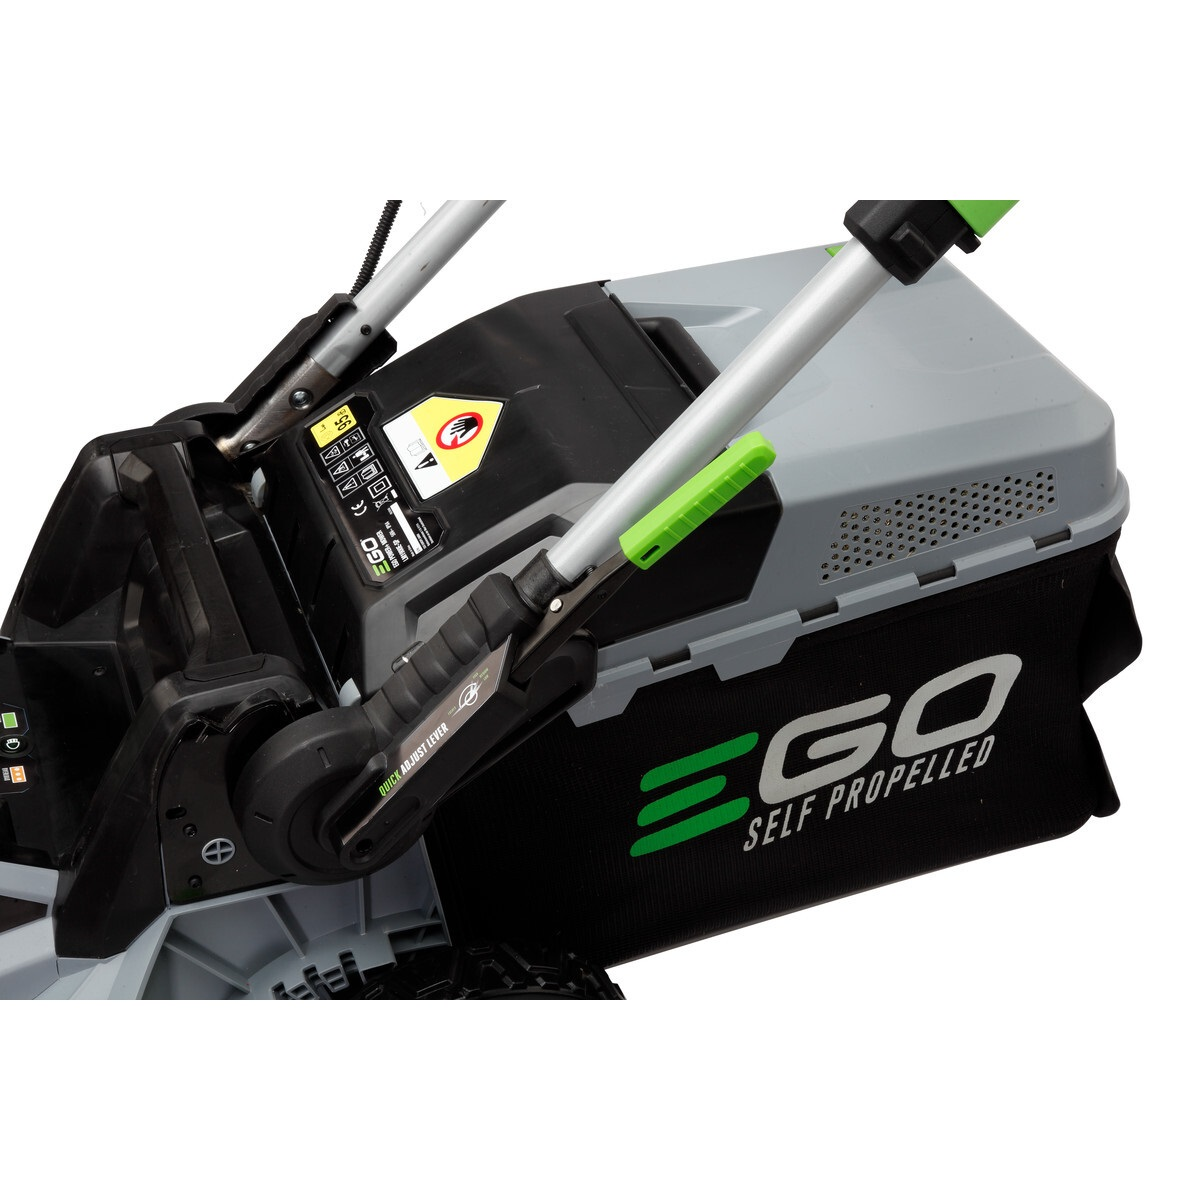 EGO Aku sekačka s pojezdem LM1903E-SP sada EGO G80004 L-11